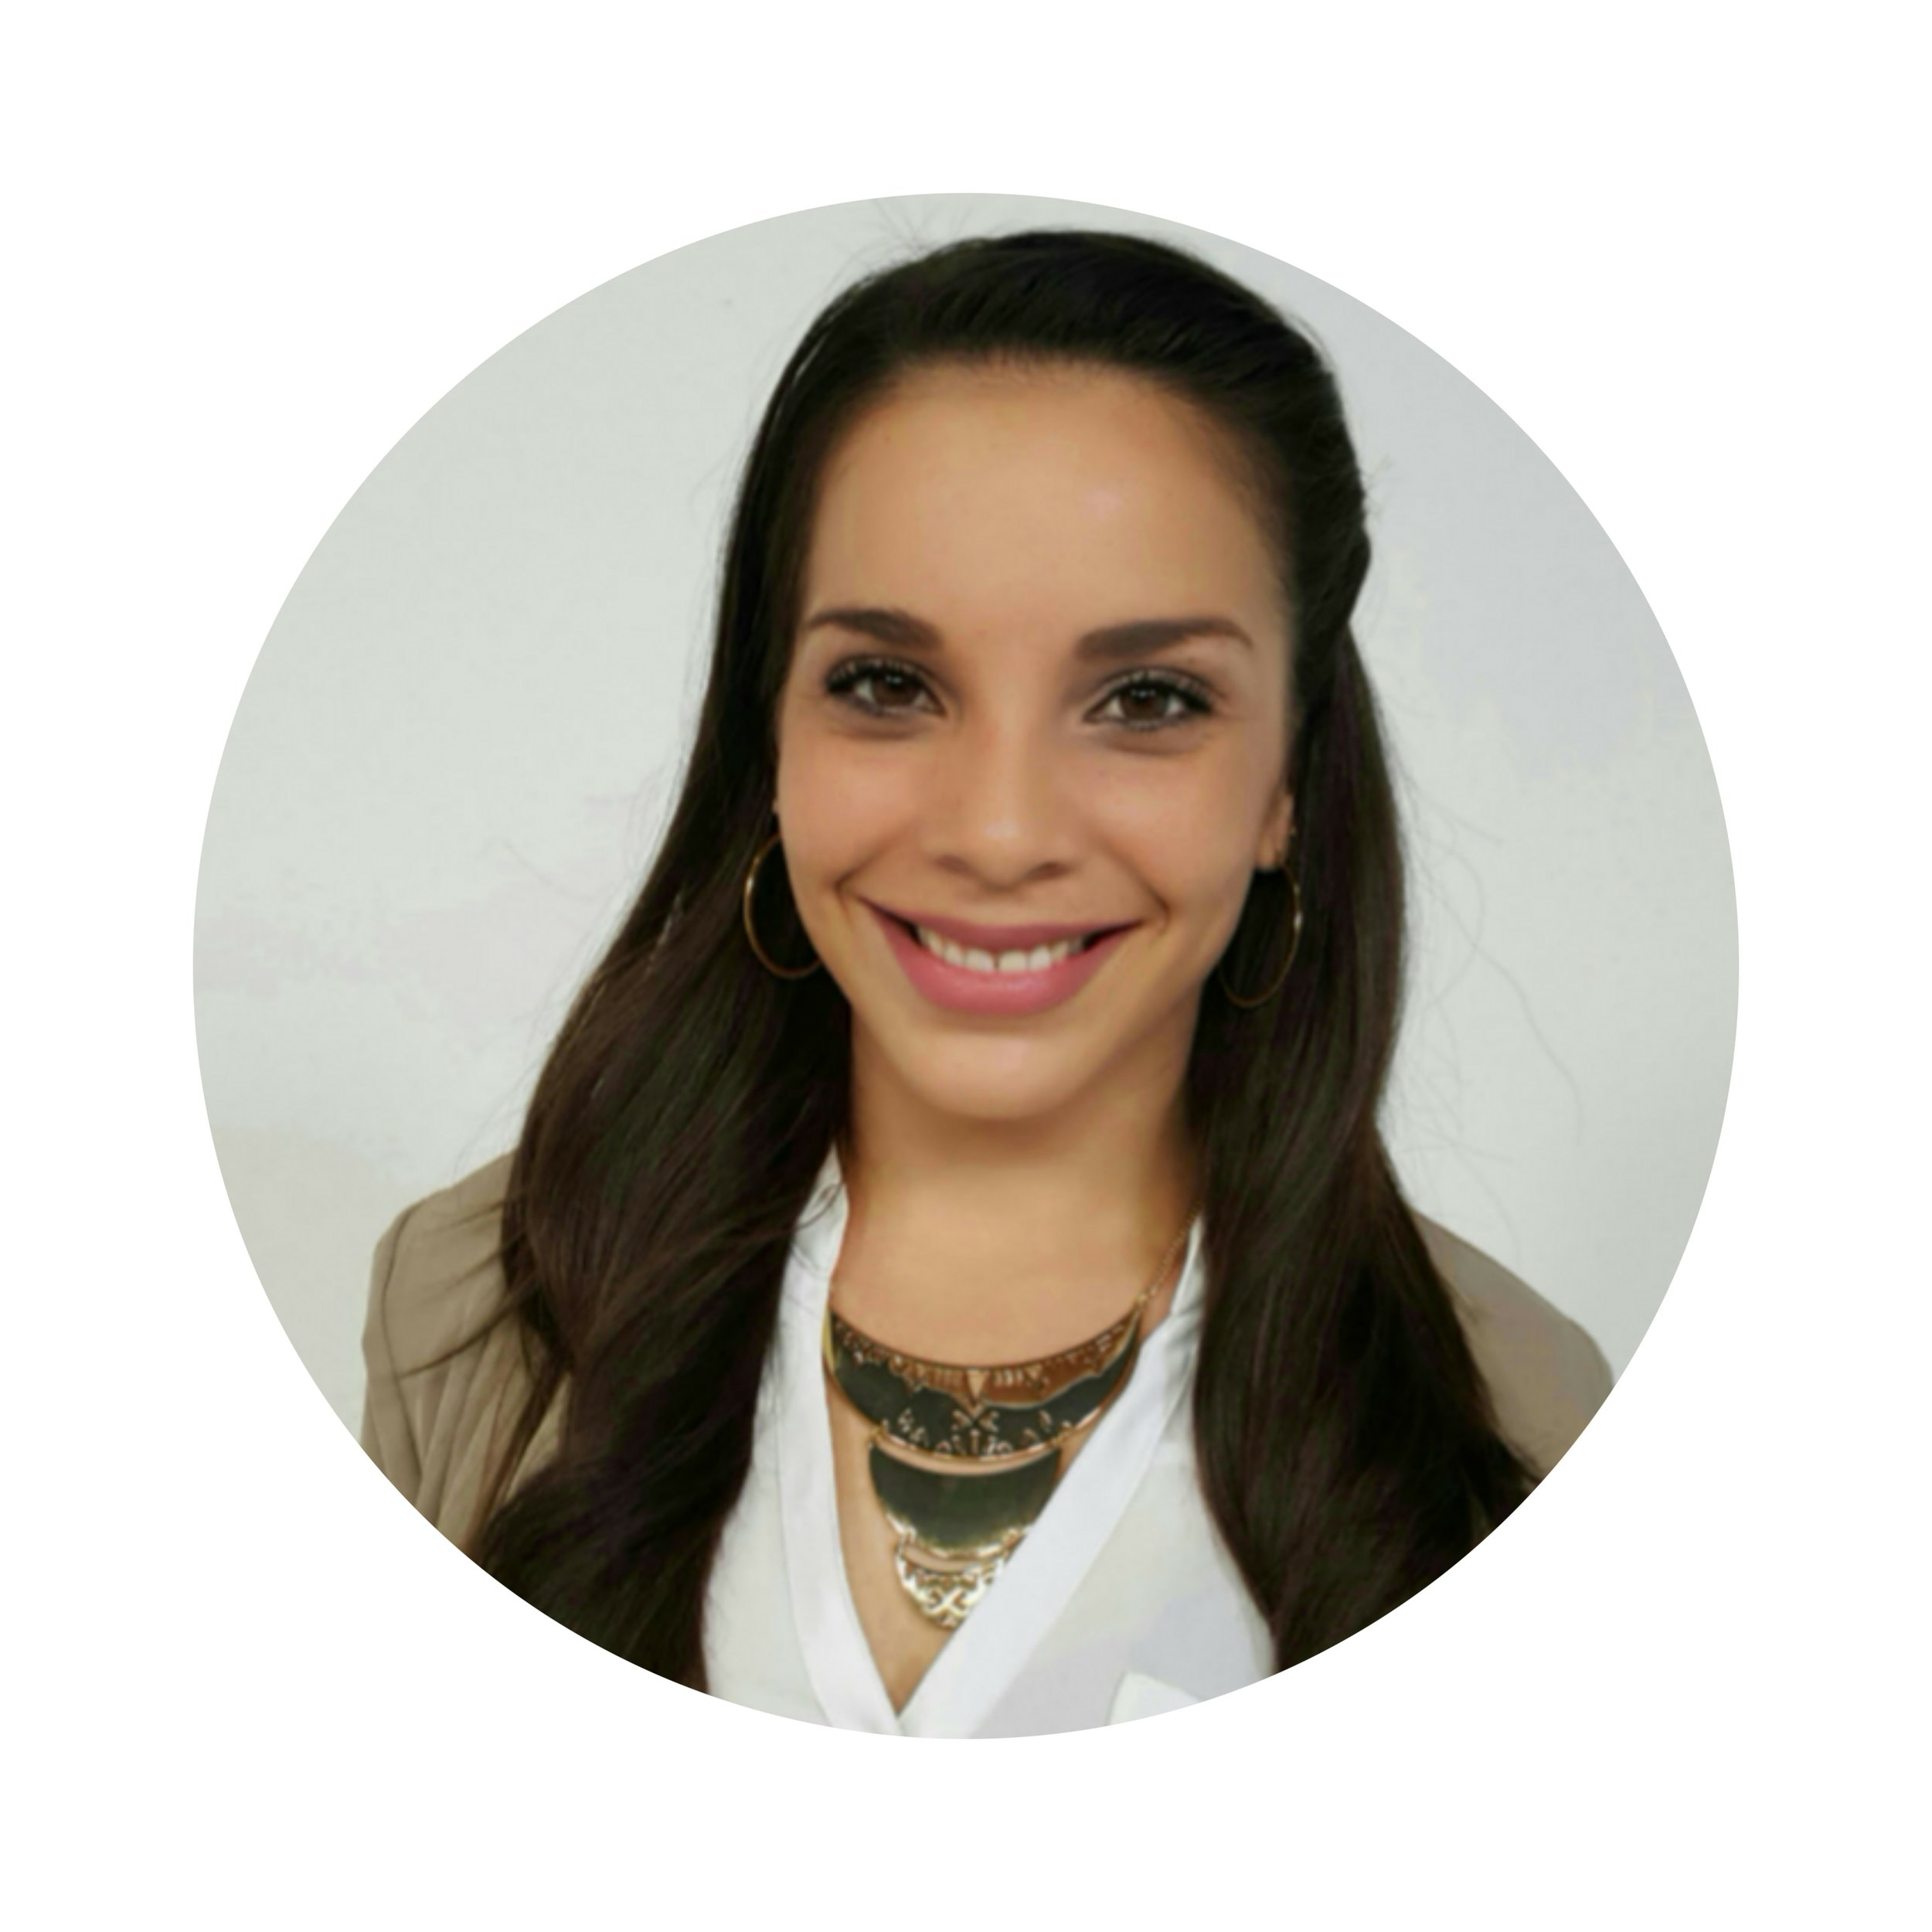 Liz Quandt, Co-Founder, Chief Millennial Officer